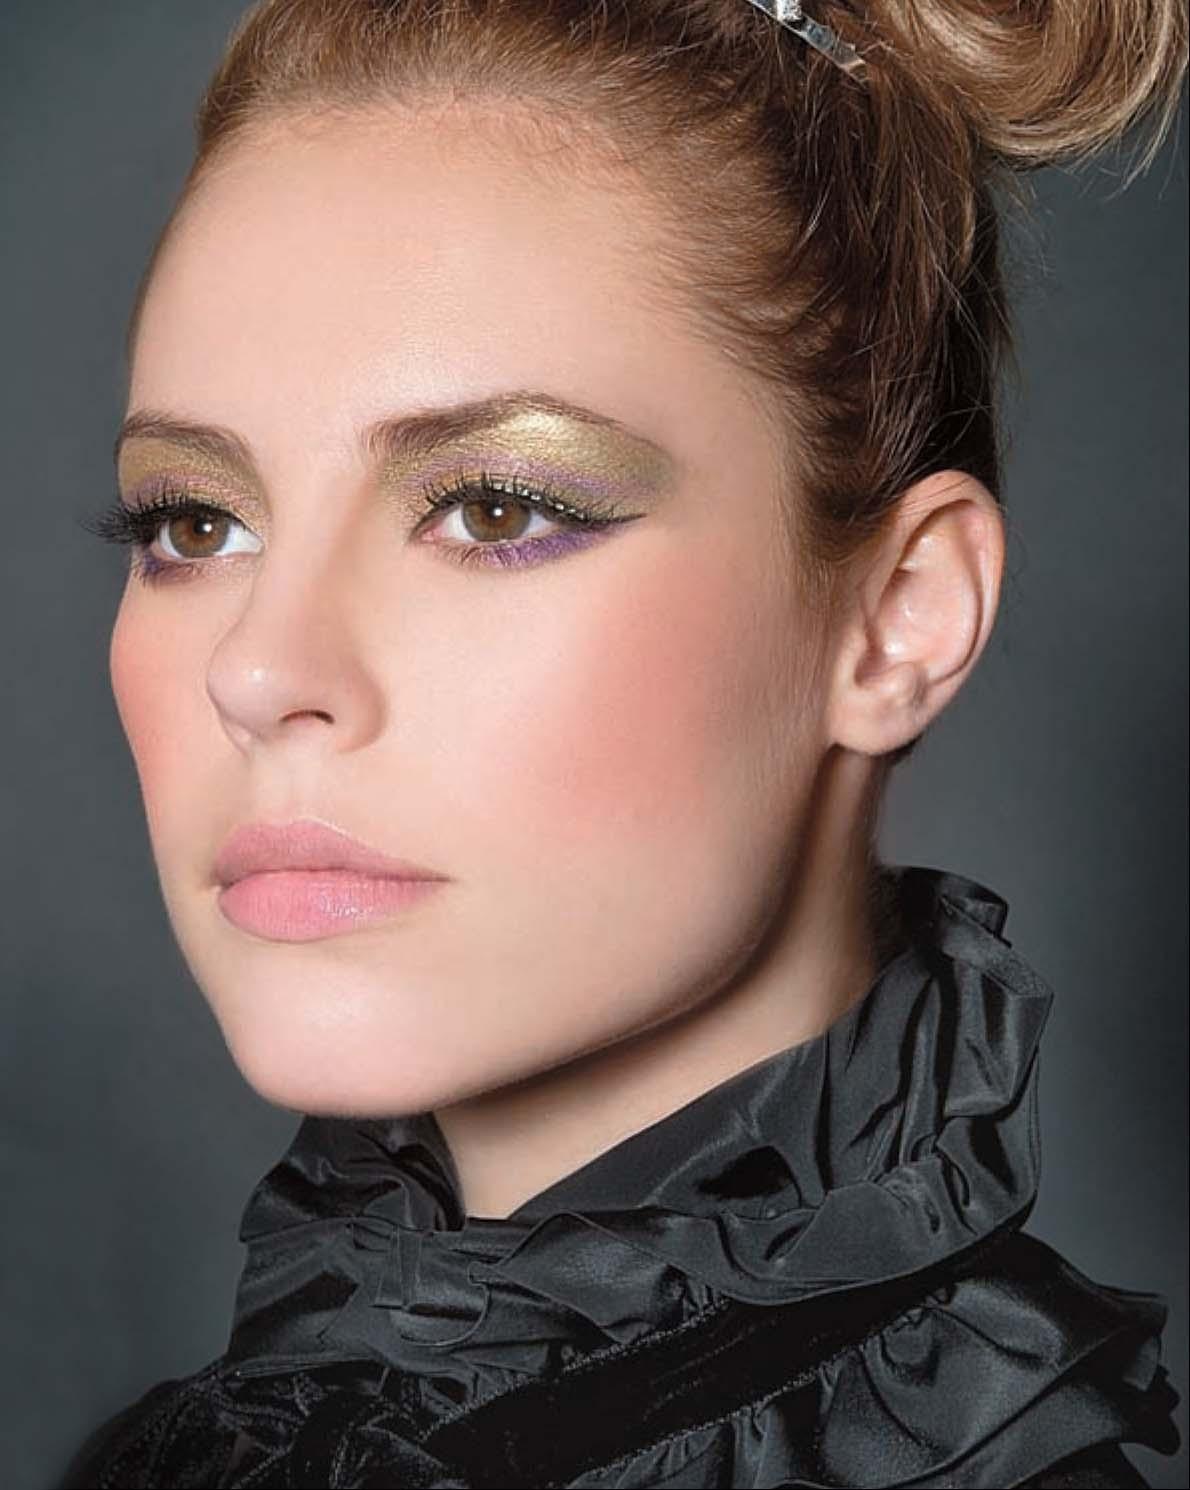 Women Most Beautiful And Hot Members Of Brazil Paolla